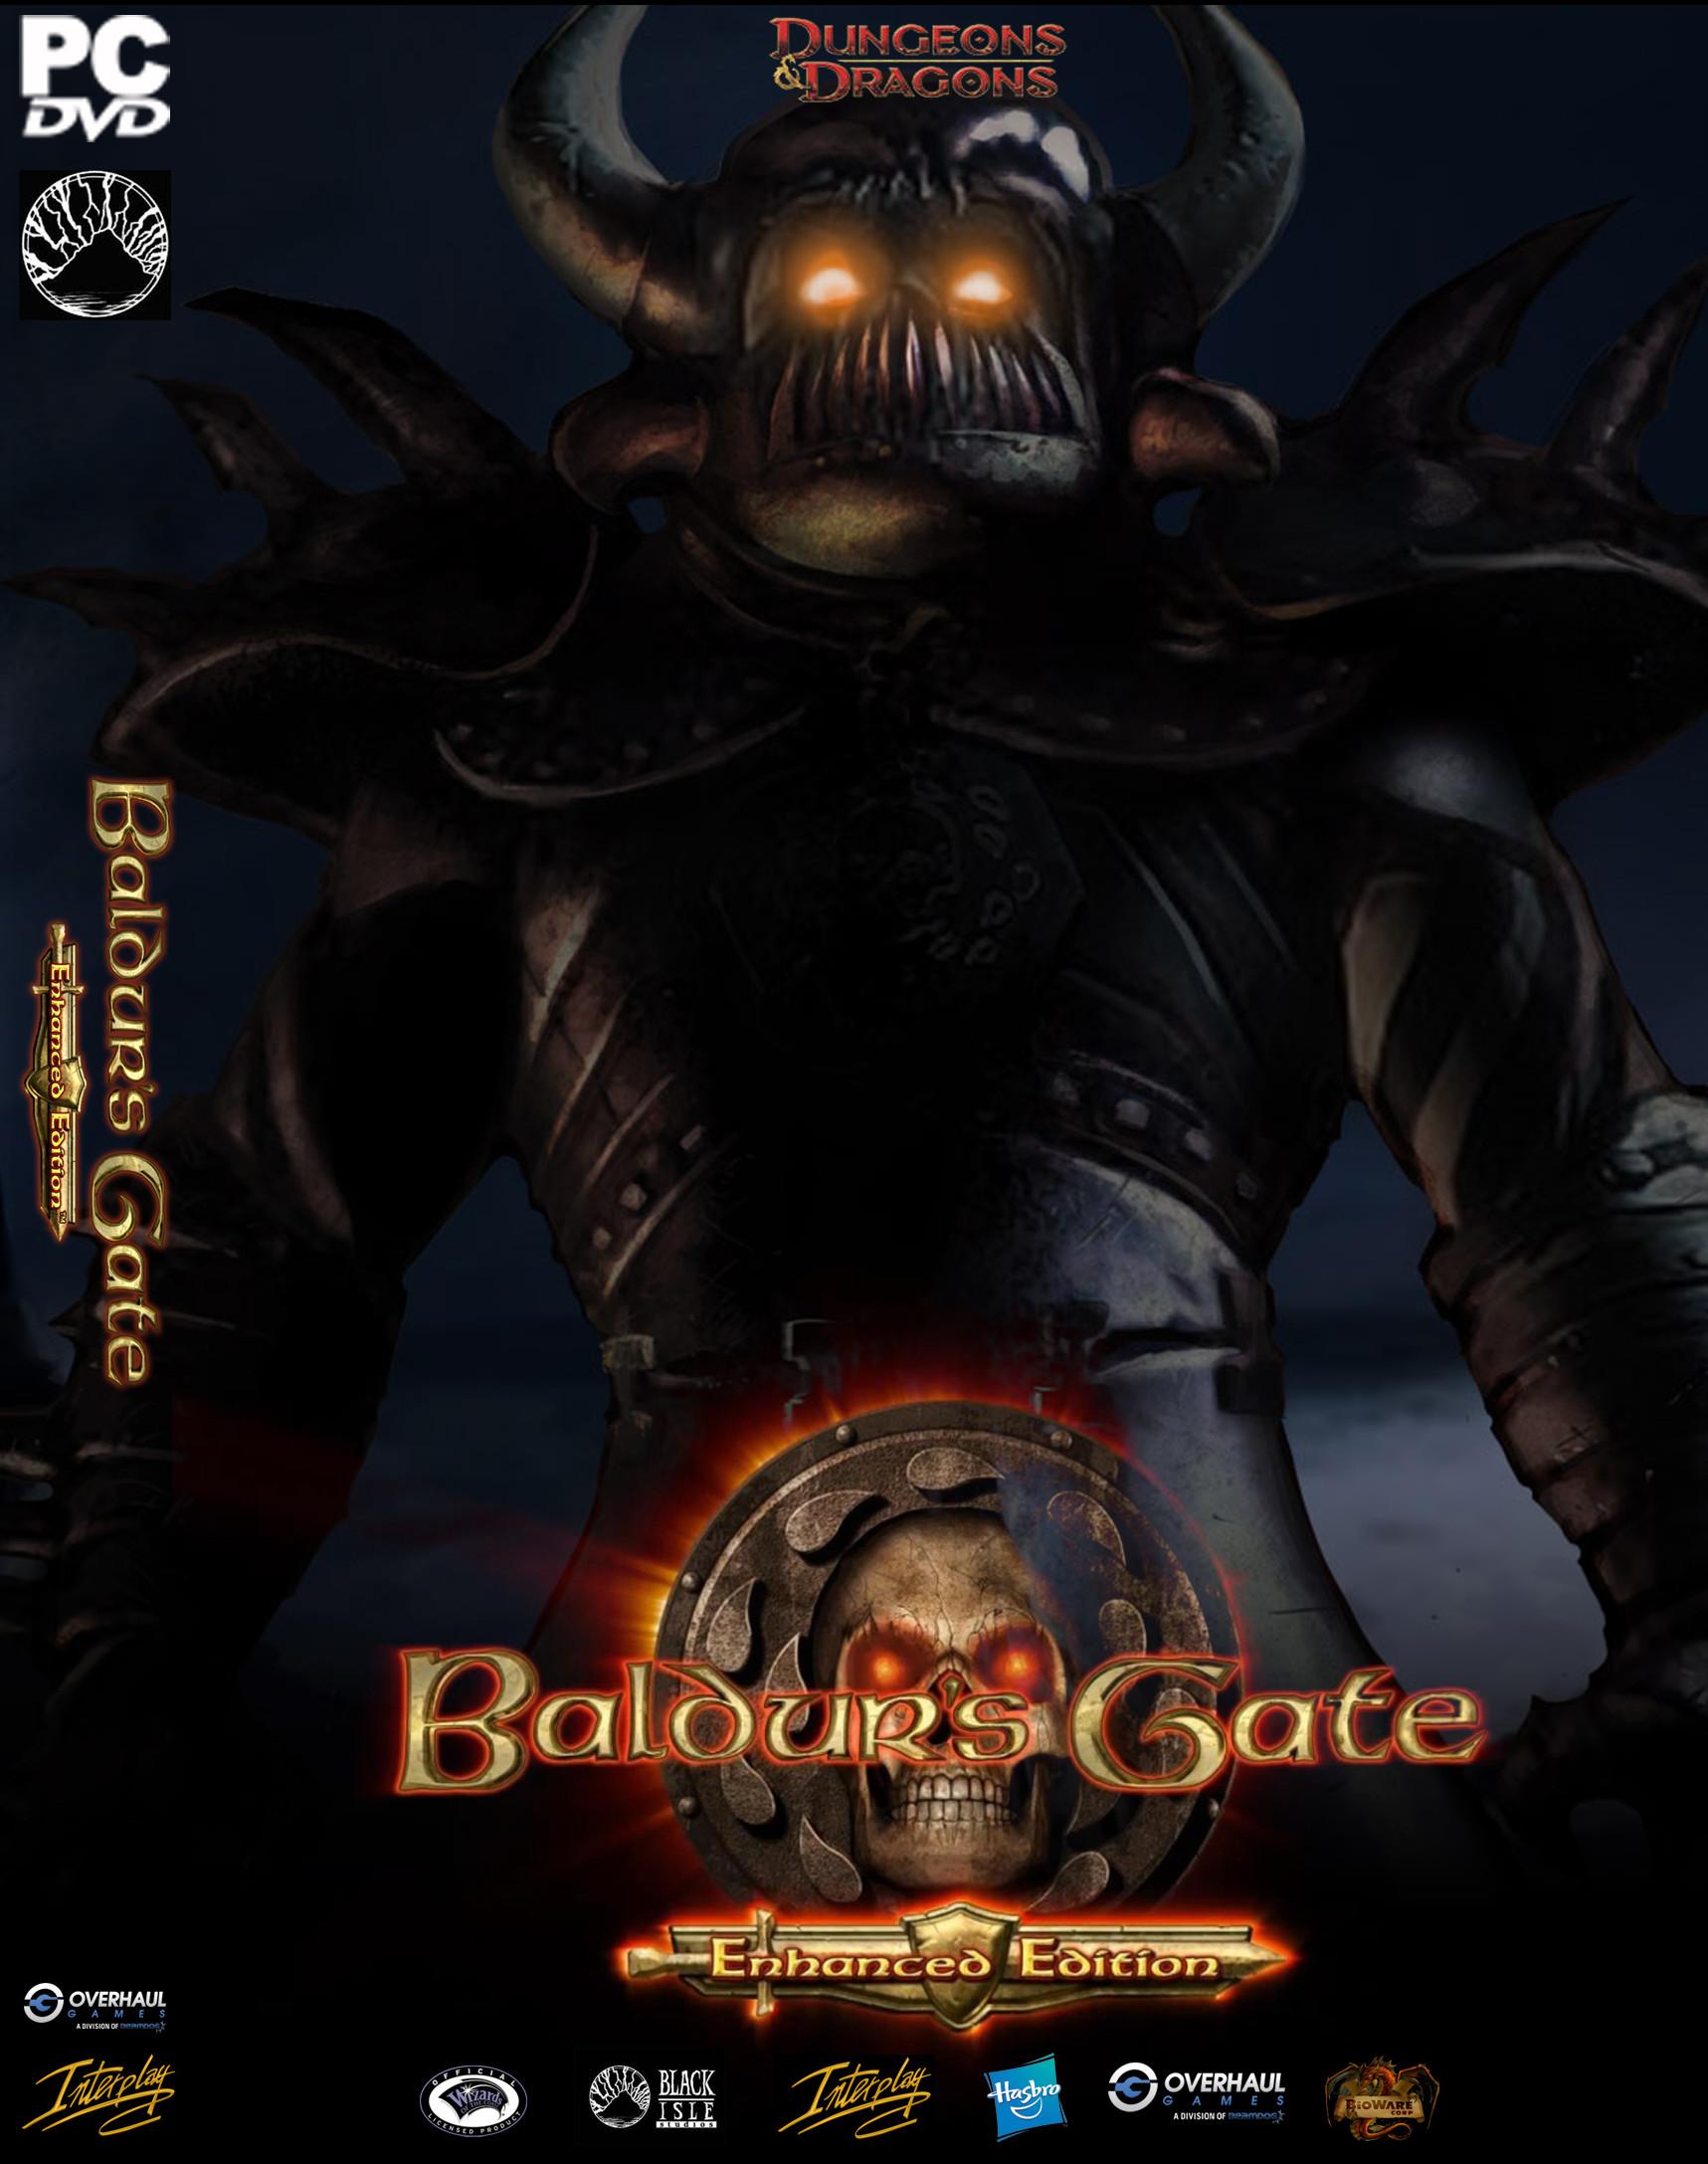 baldurs gate trilogy enhanced edition download